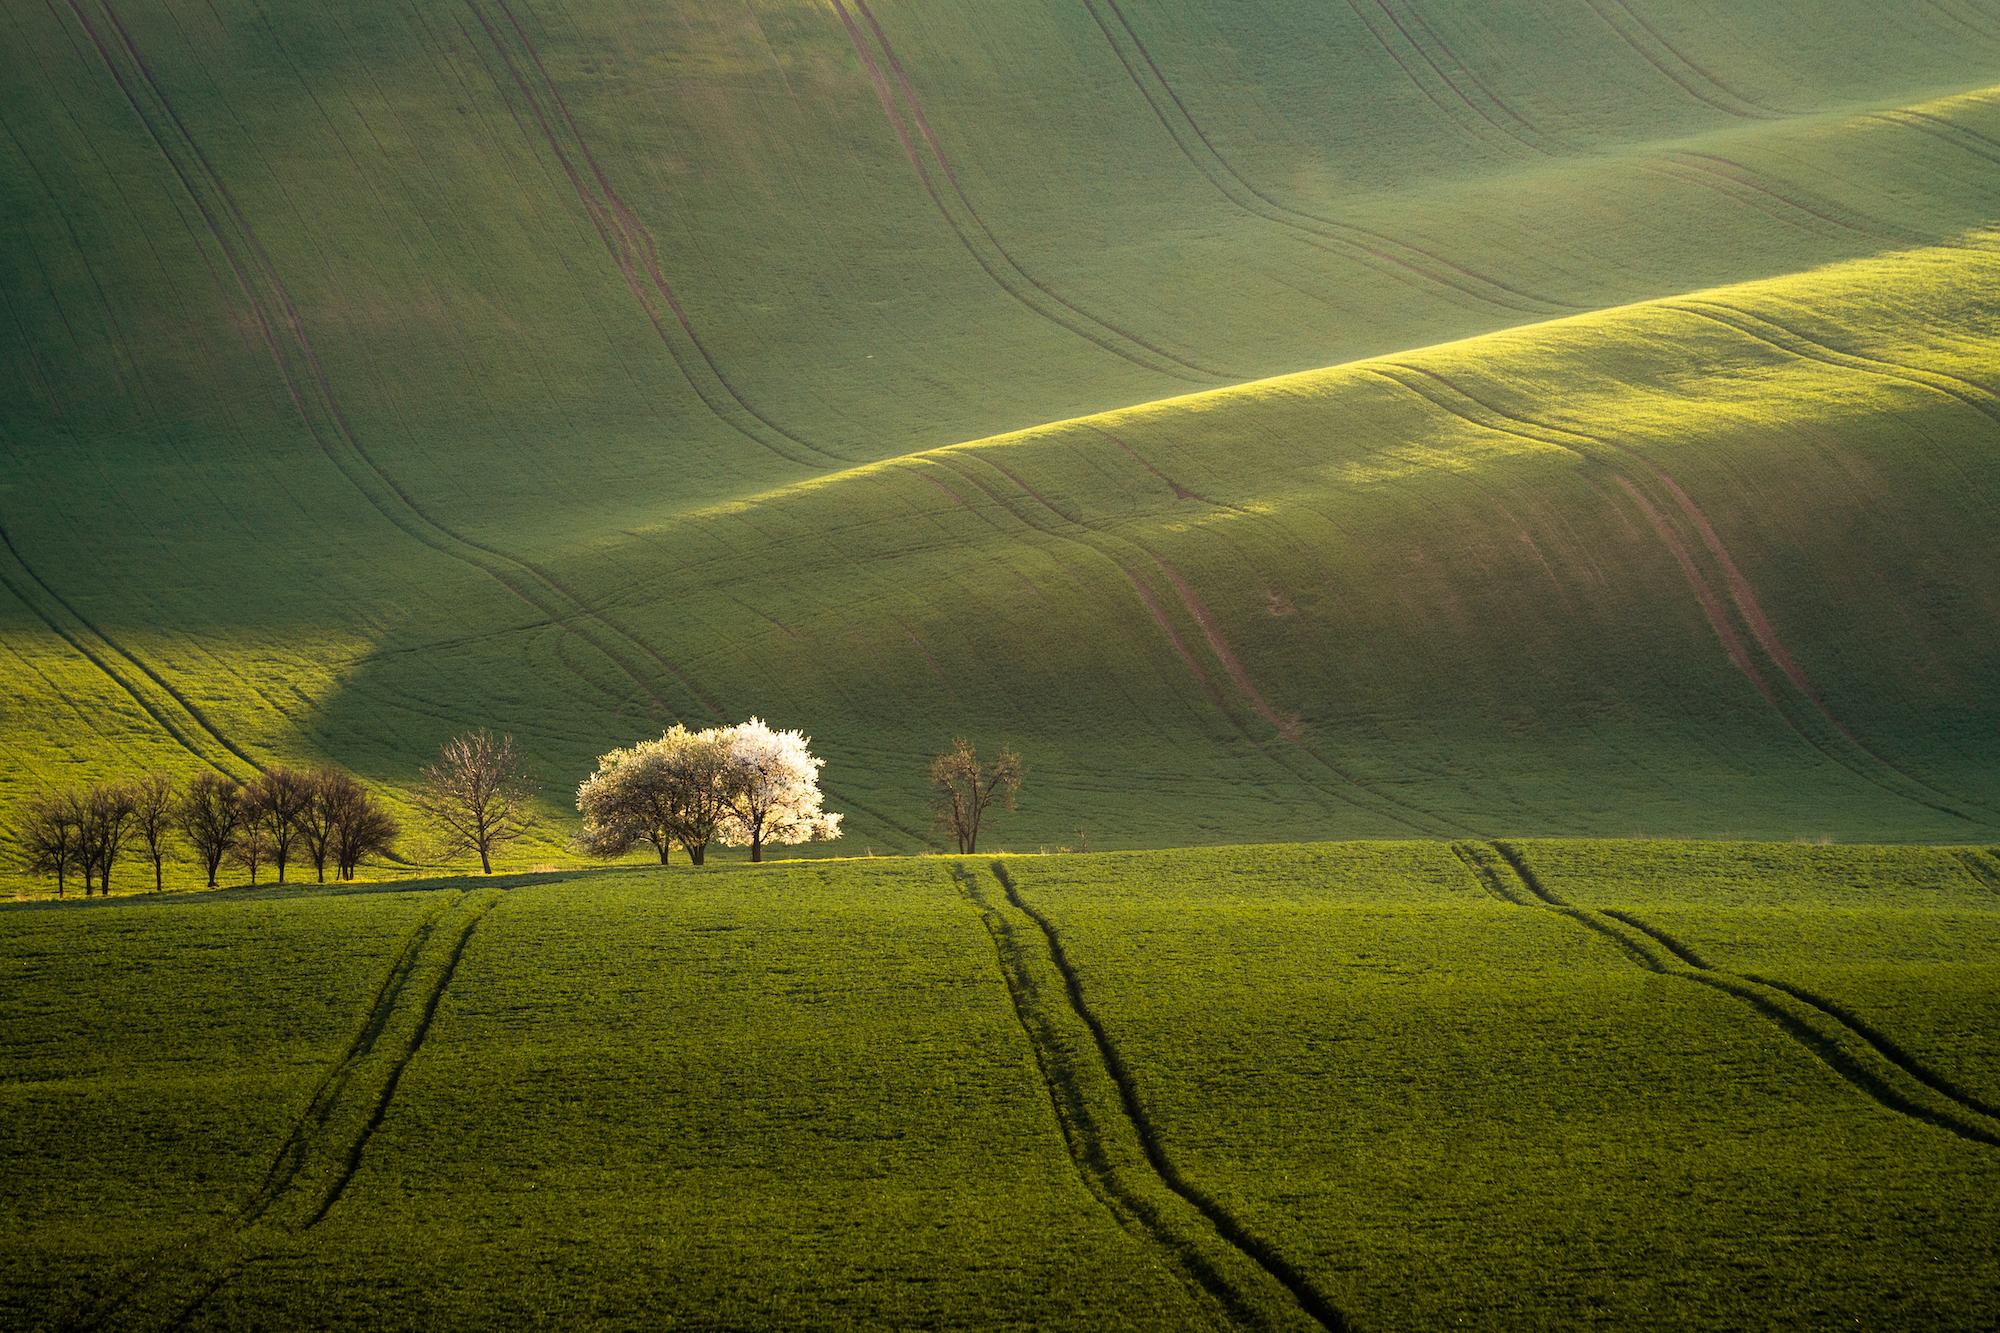 Minimalist landscape of blooming fruit trees among the fields in Moravia, Czech Republic